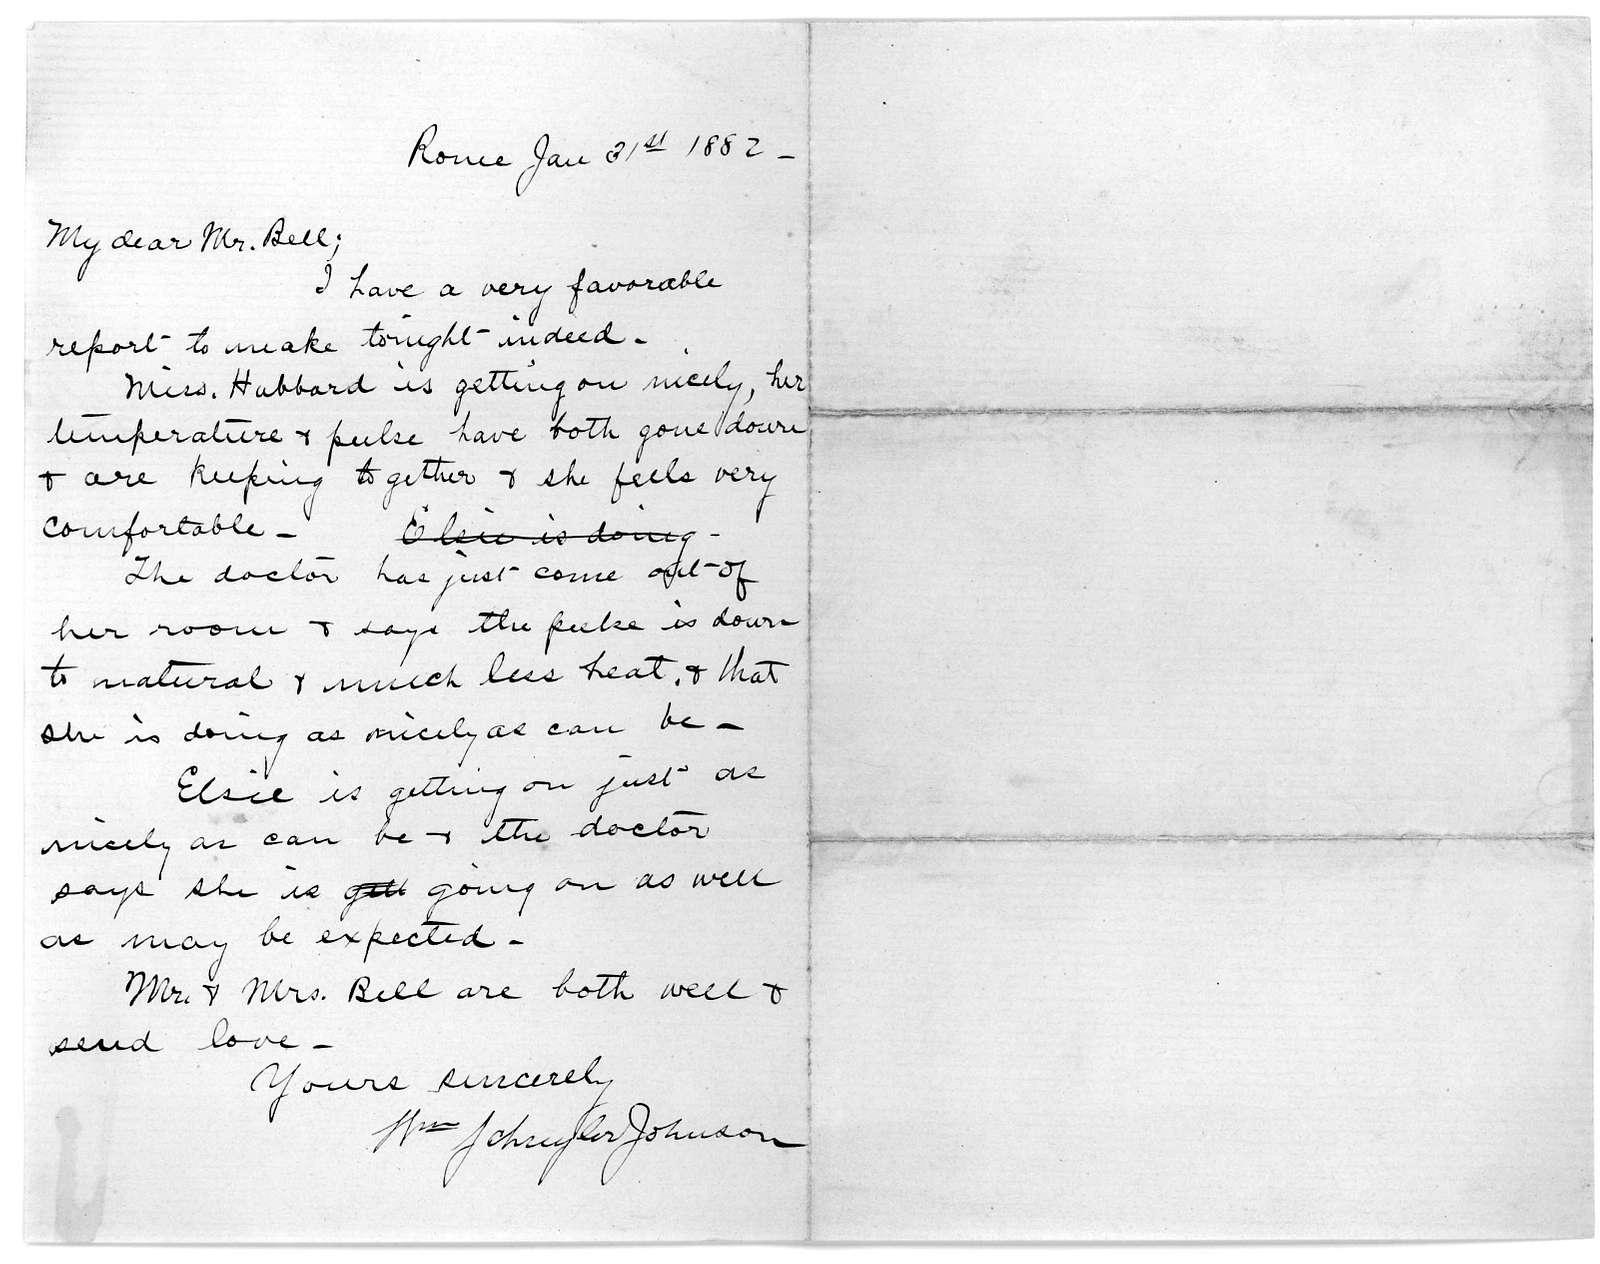 Letter from Schuyler Johnson to Alexander Melville Bell, January 31, 1882